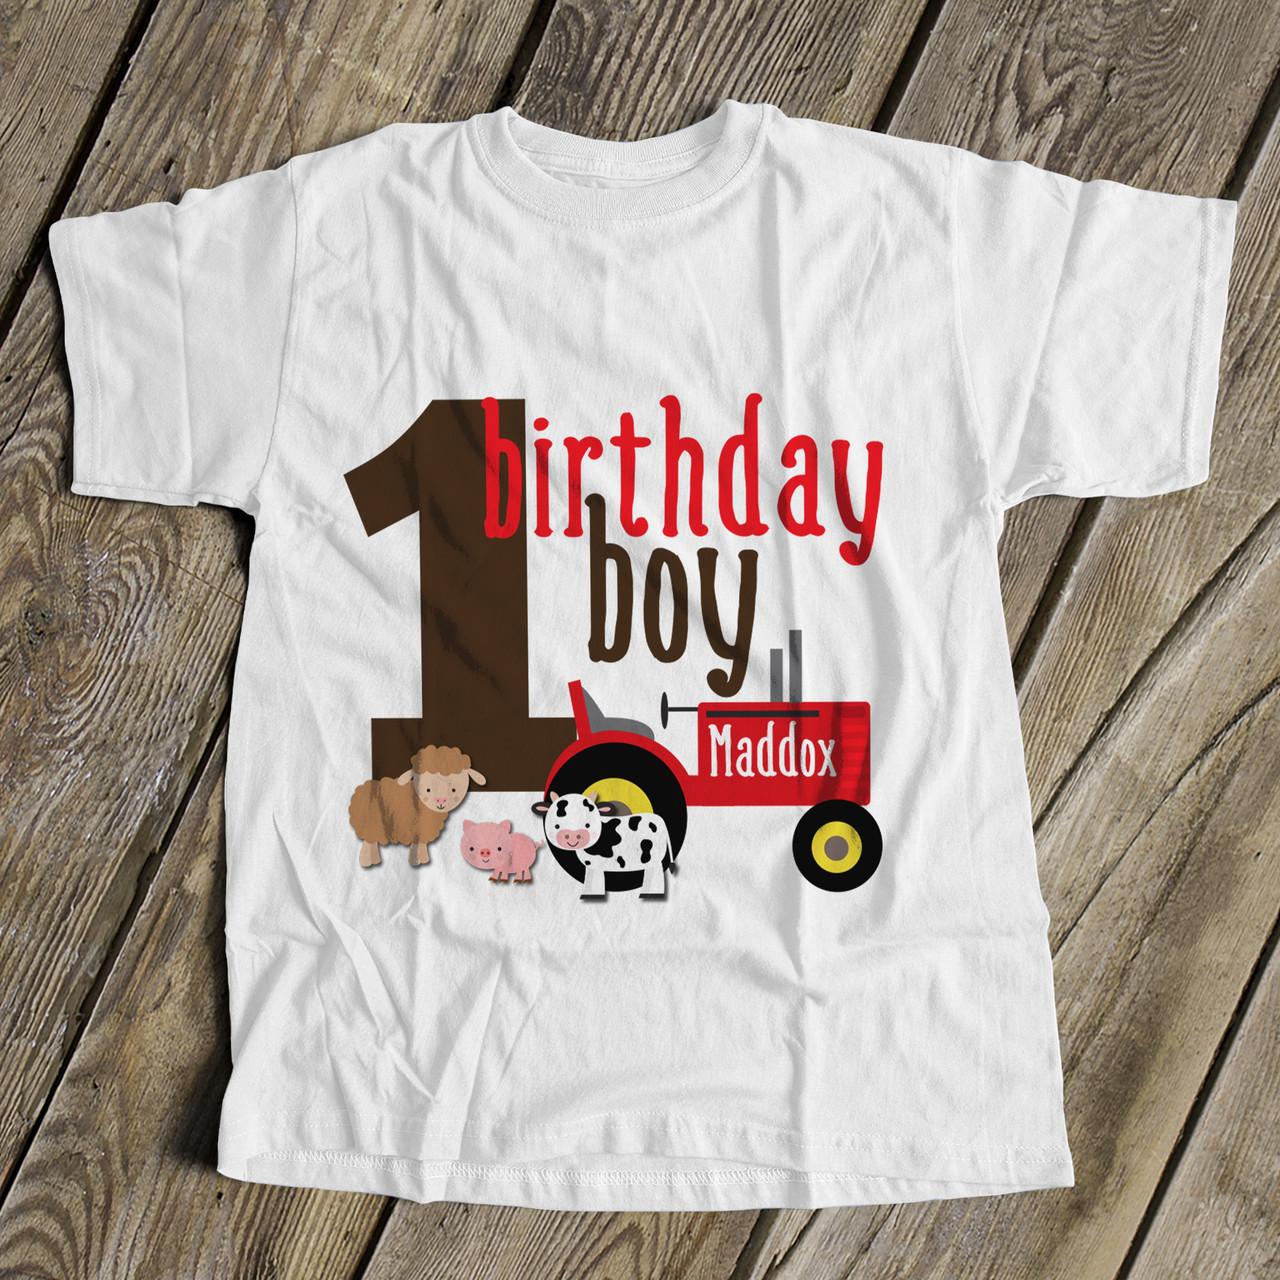 gift for kids kid kids shirt kids gift birthday shirt kids four shirt Fifth birthday toddler shirt kids shirt personalized shirt